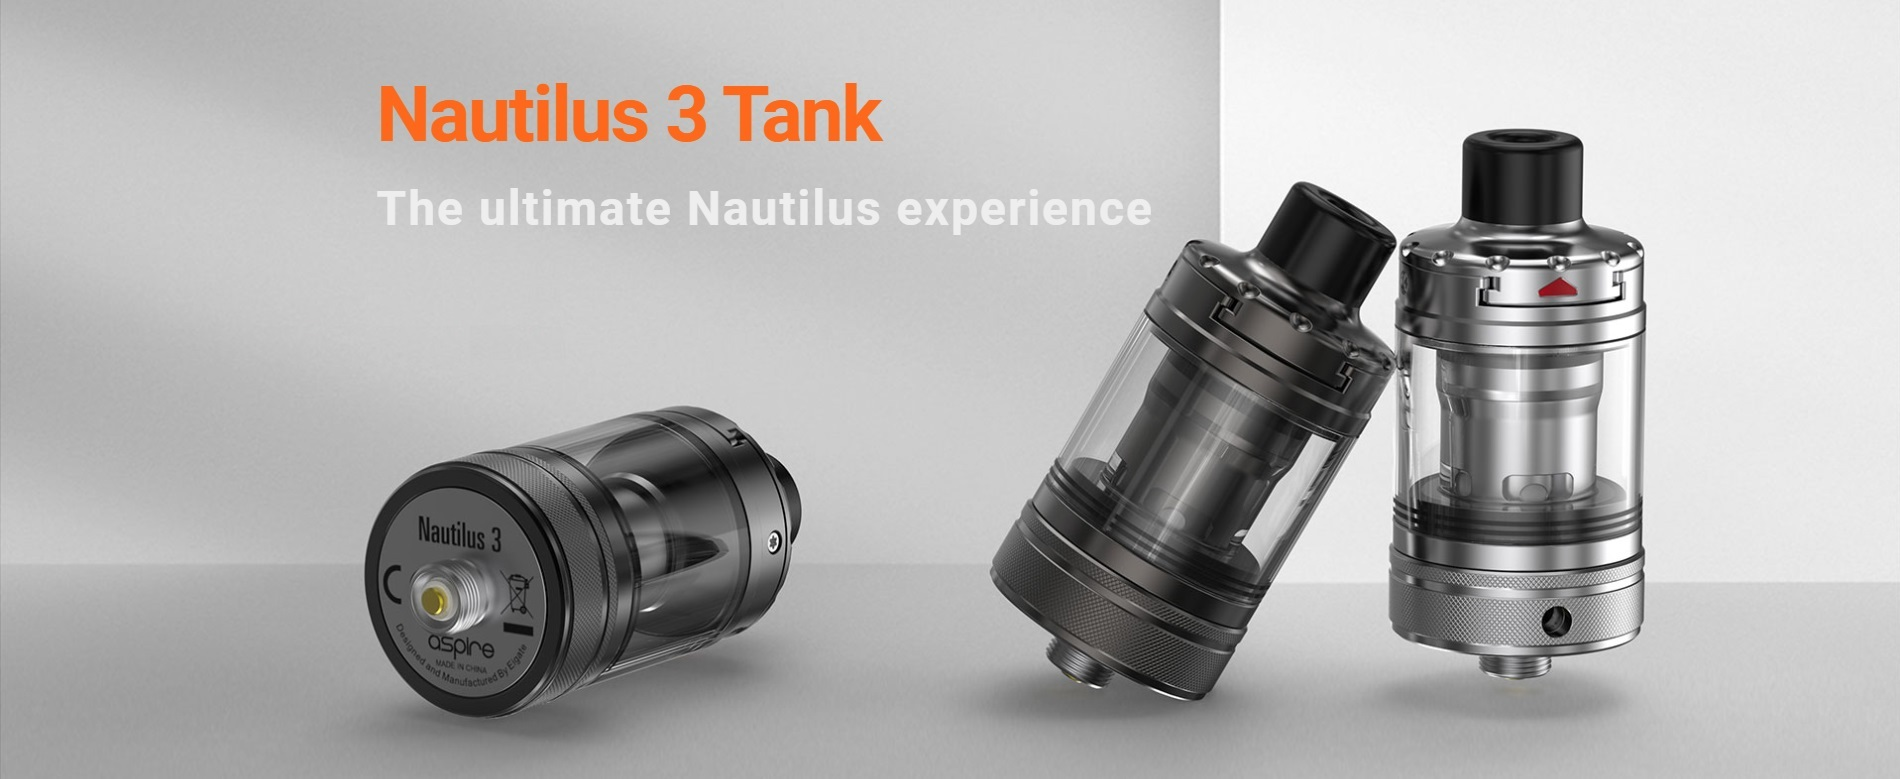 nautilus 3 tank 24mm by aspire 1 - Nautilus 3 Tank 24mm by Aspire